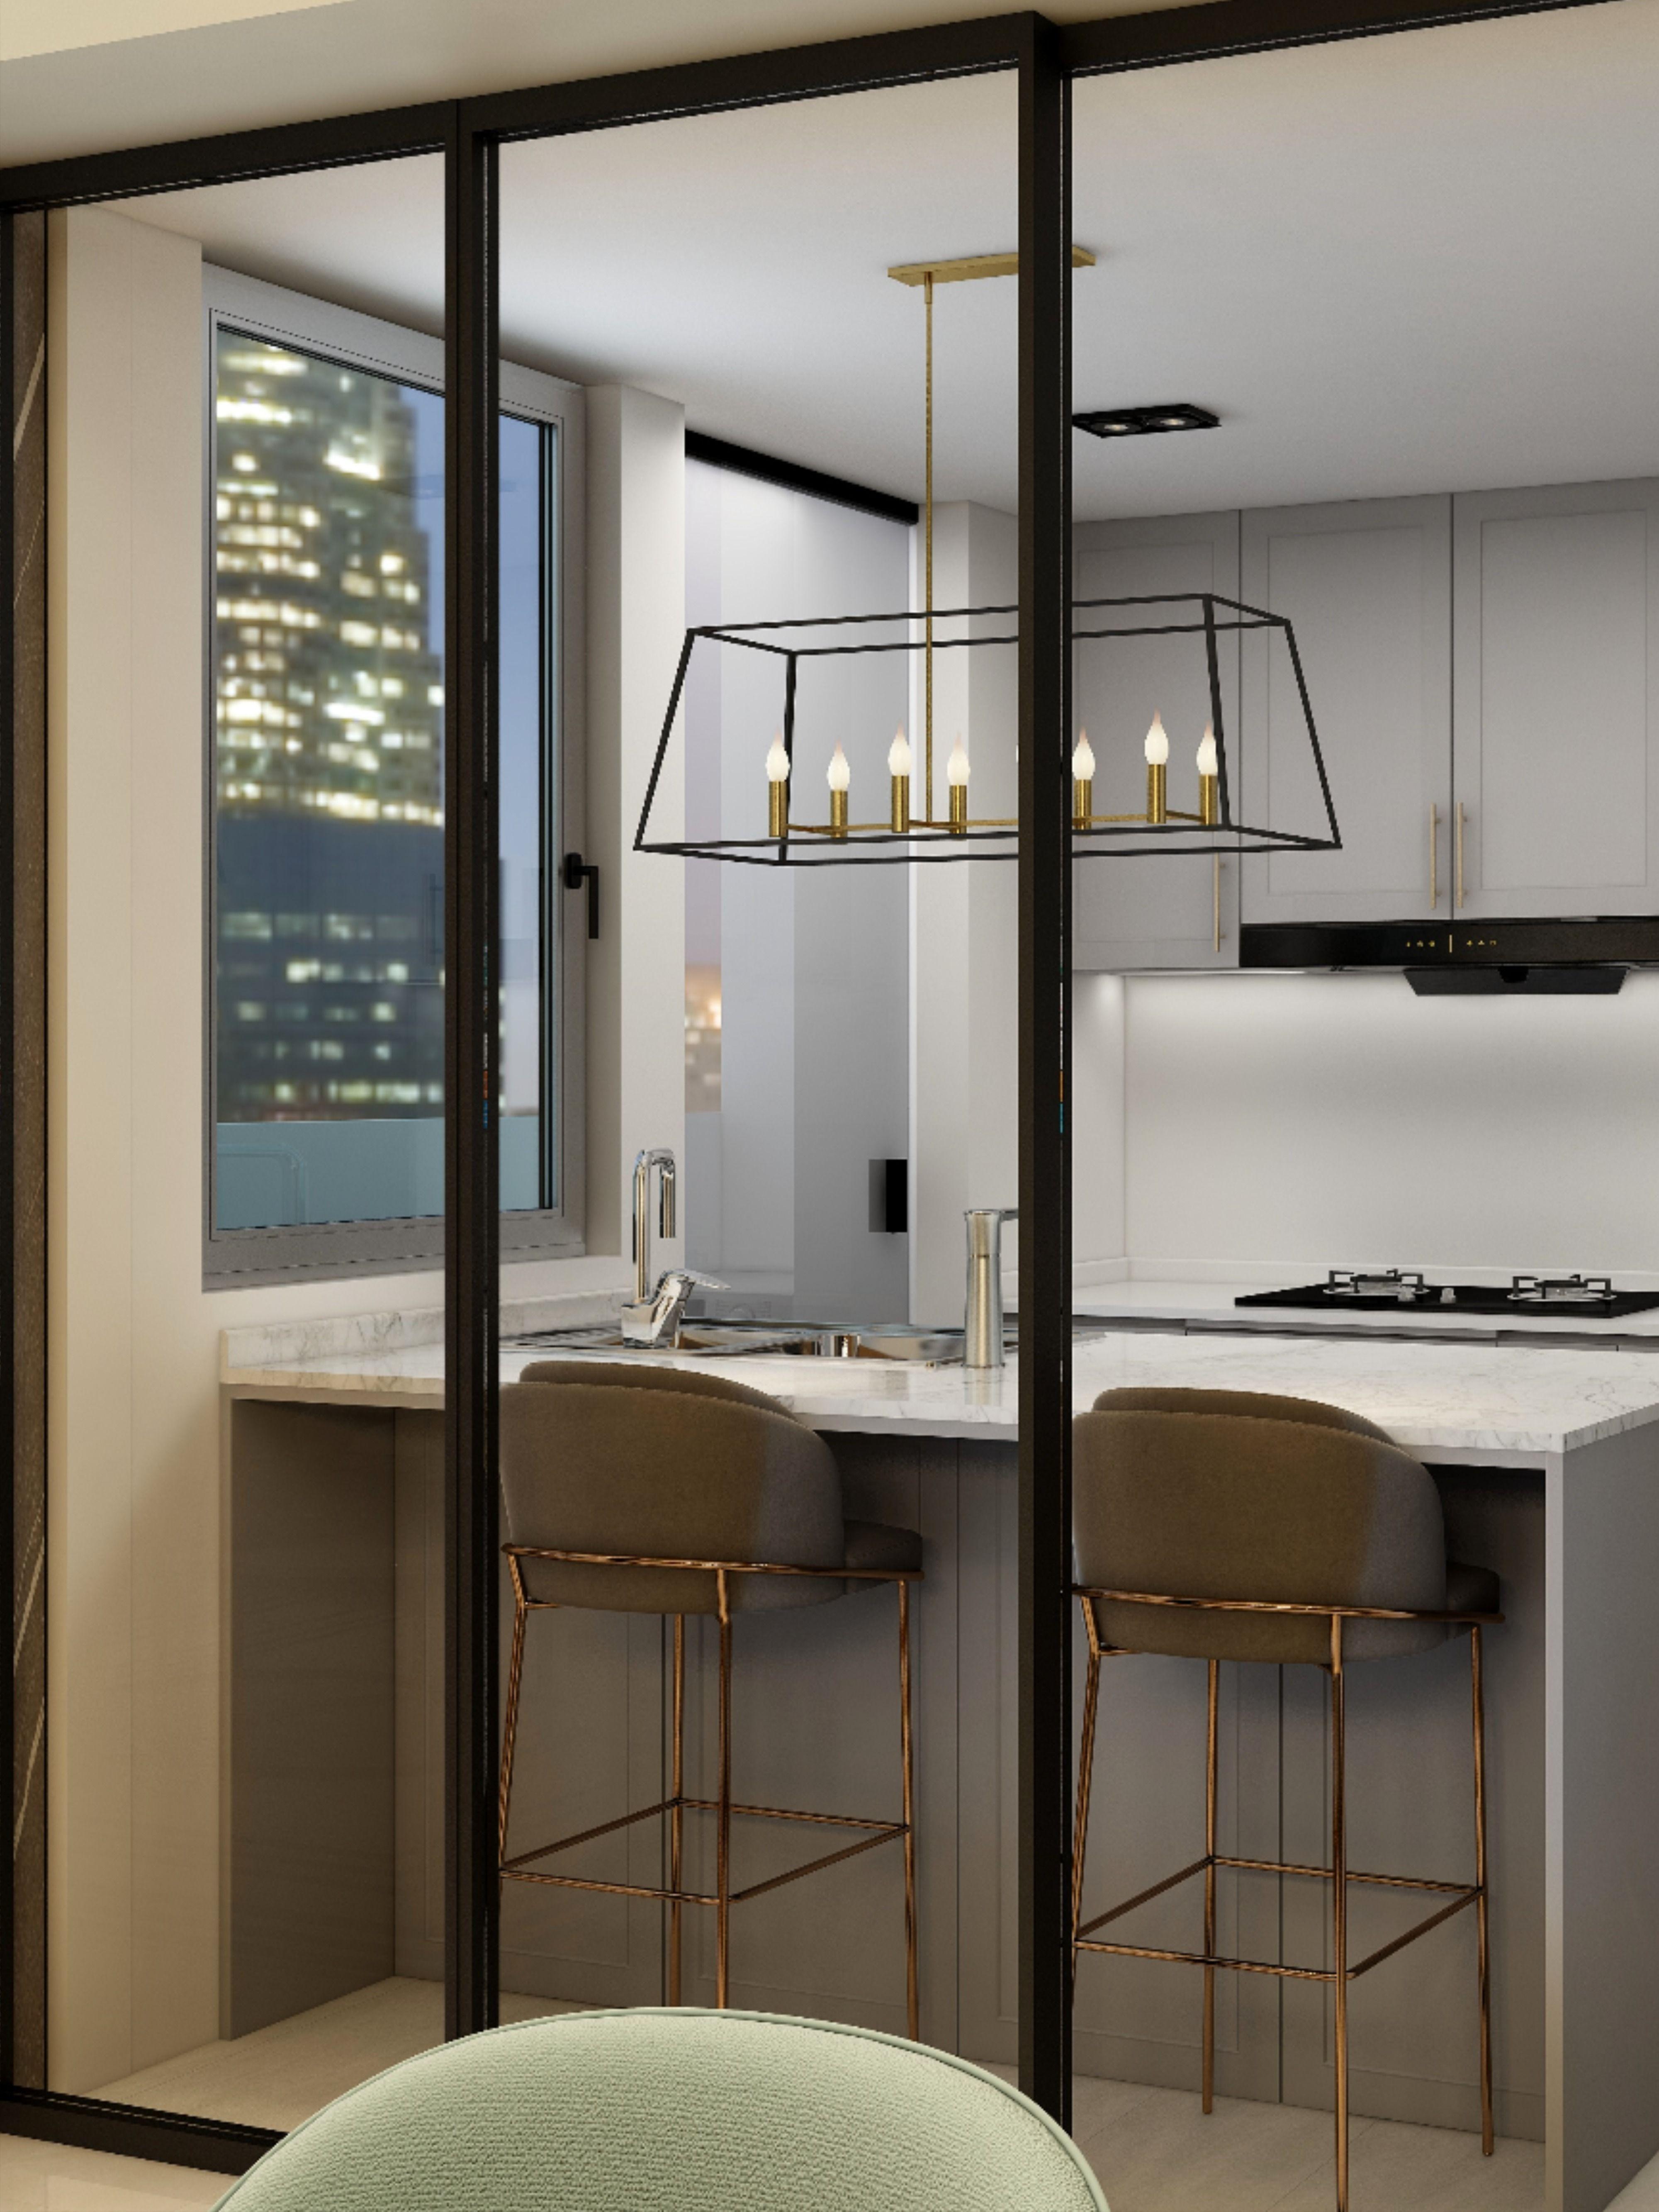 Kitchen Sliding Door Montview Condo In 2020 Condo Interior Design Modern Luxury Interior Condo Interior